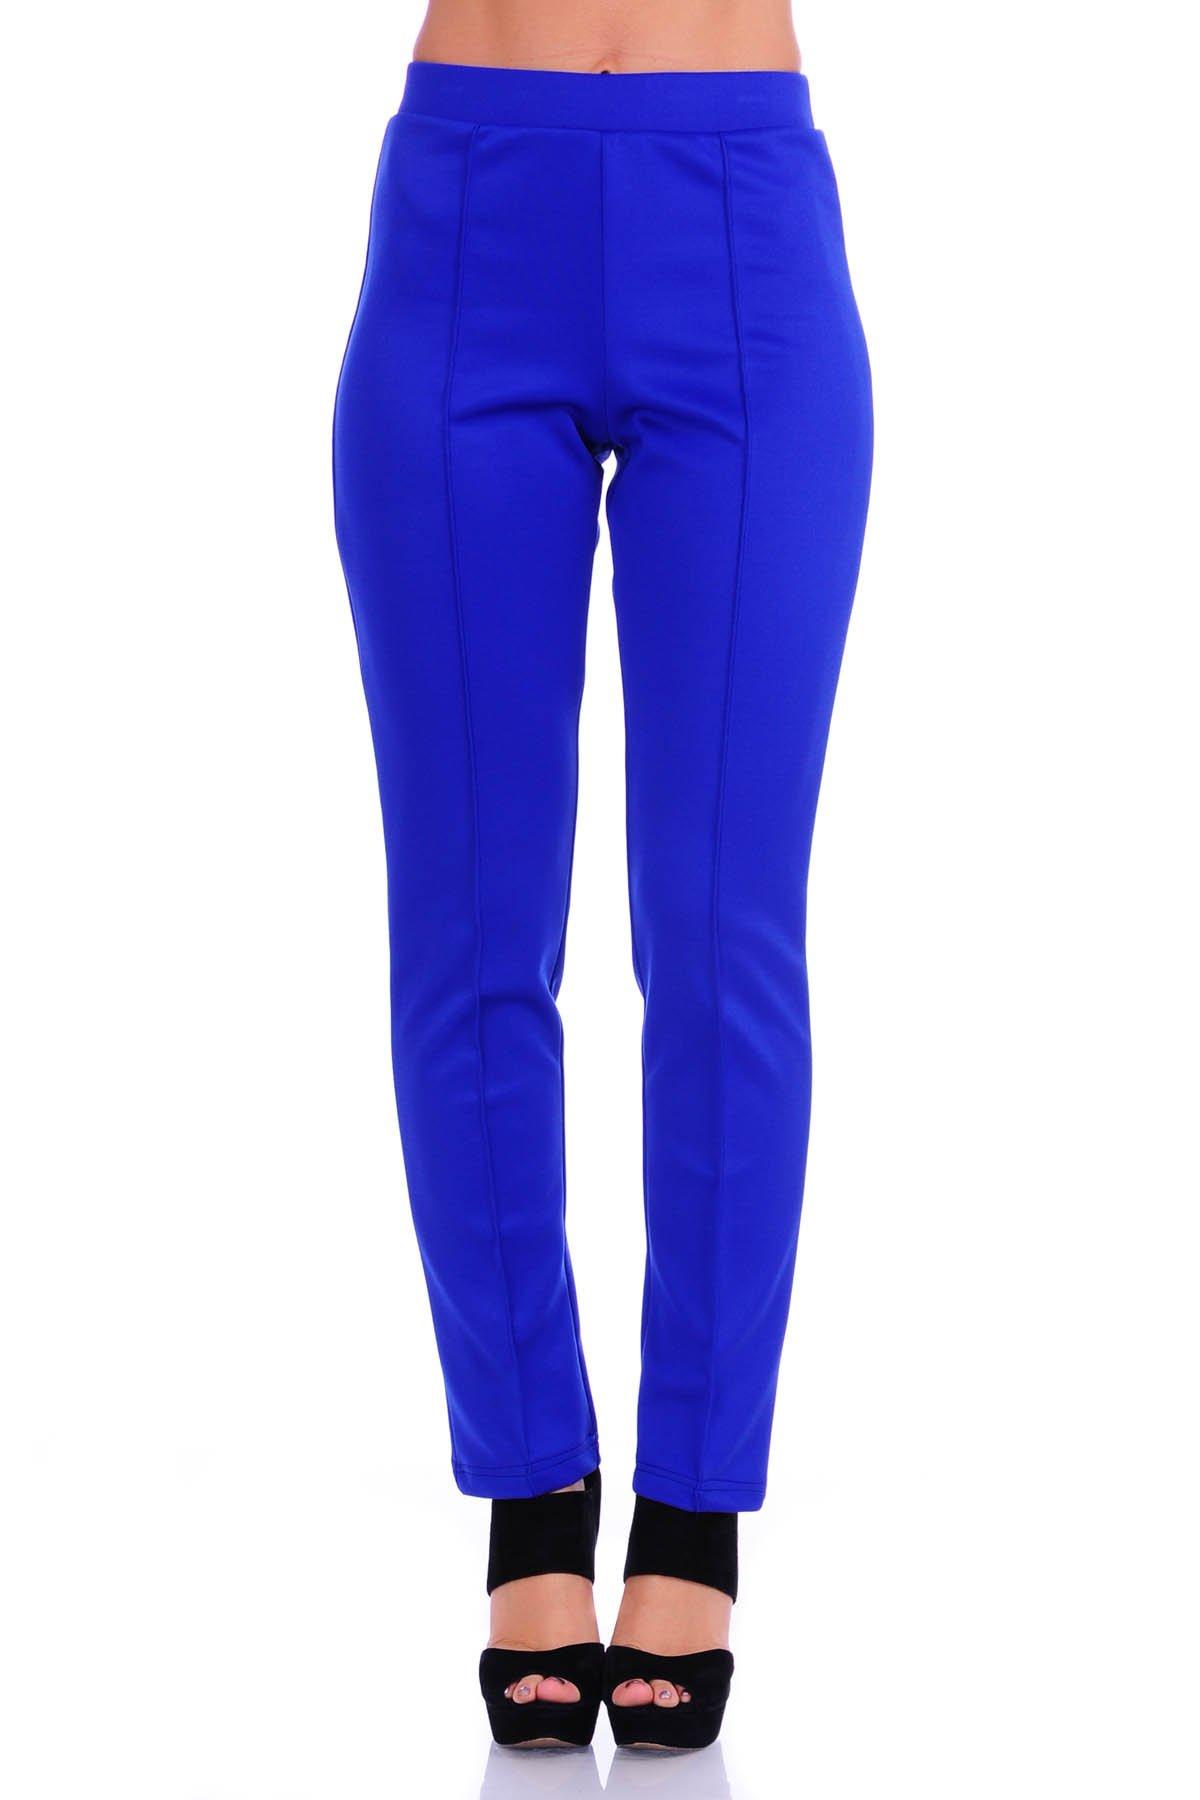 SR Women's Solid Stretch Straight Leg Slim Fit Pants, 3X, Royal